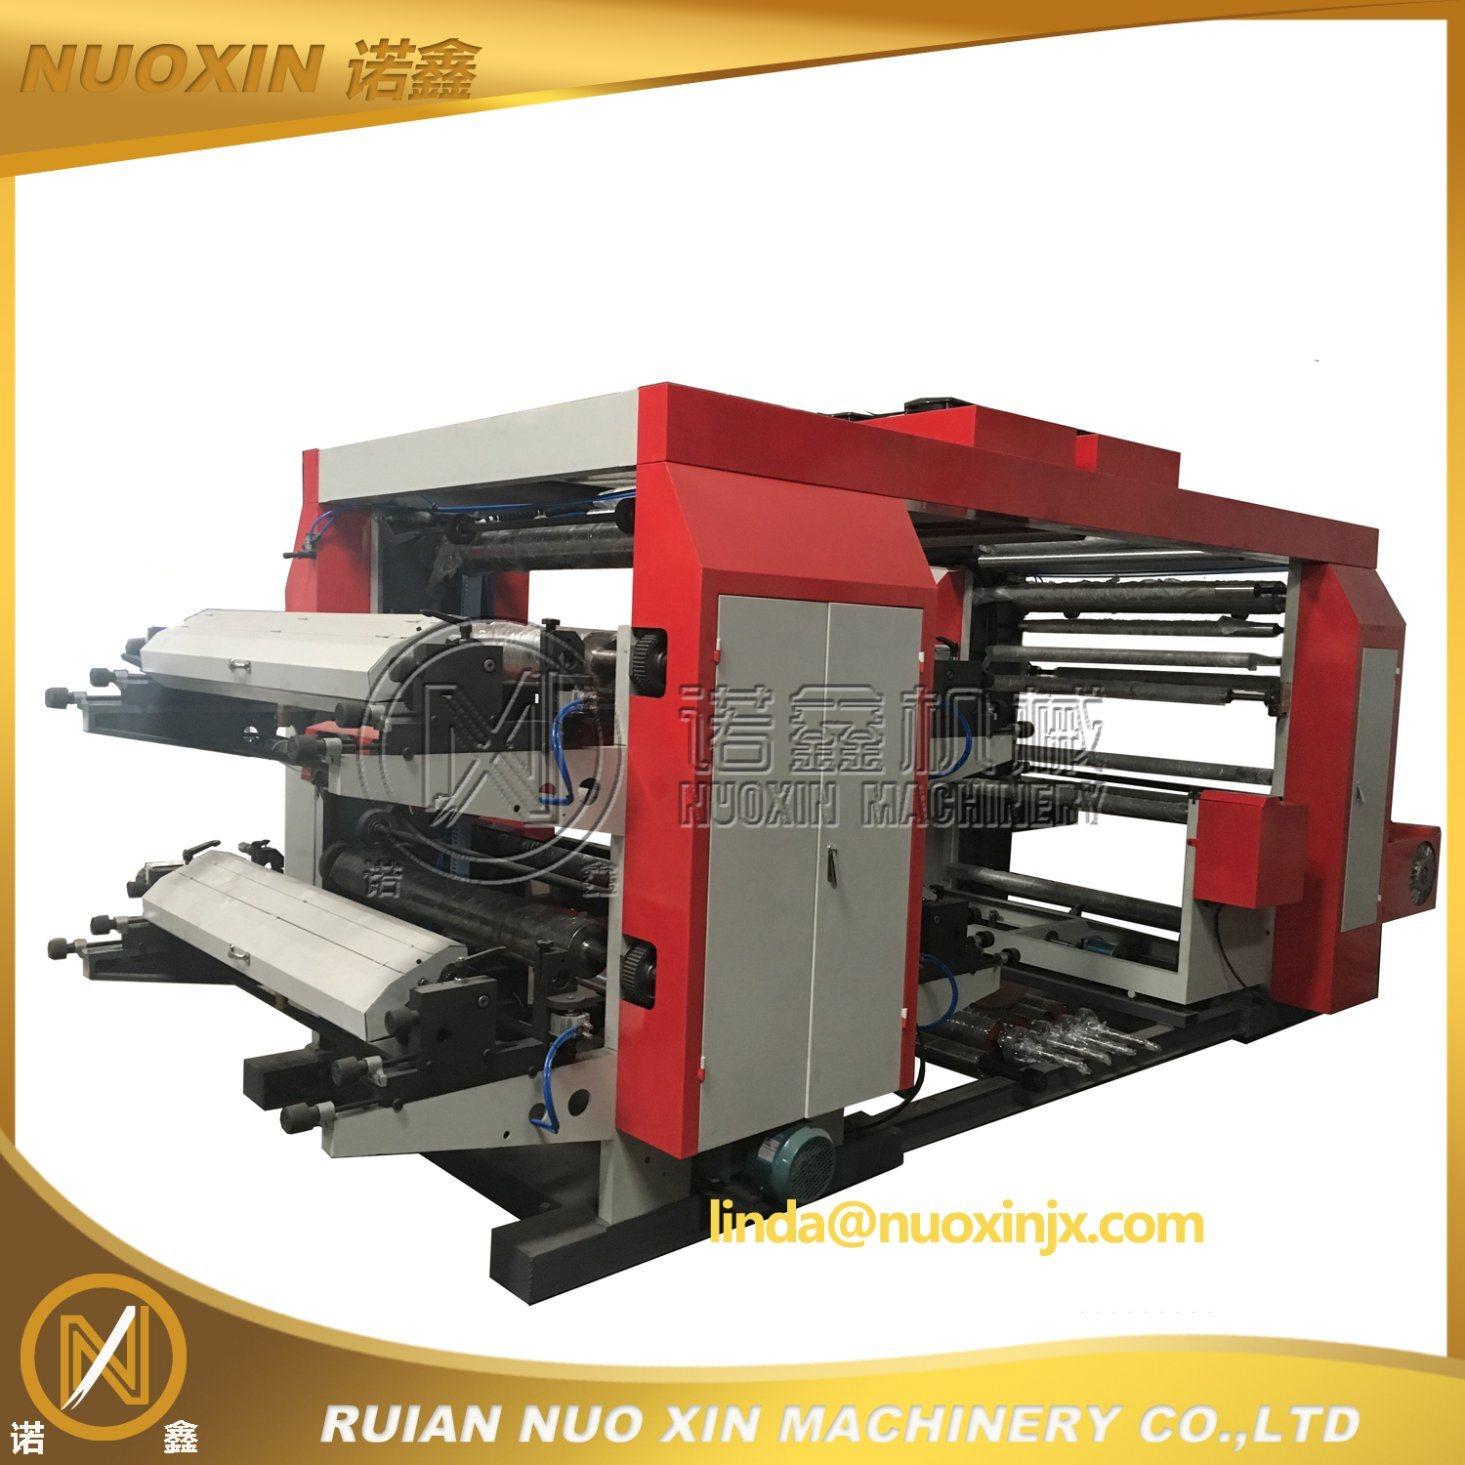 4 Colour Non Woven Fabric Flexographic Printing Machine (NX)